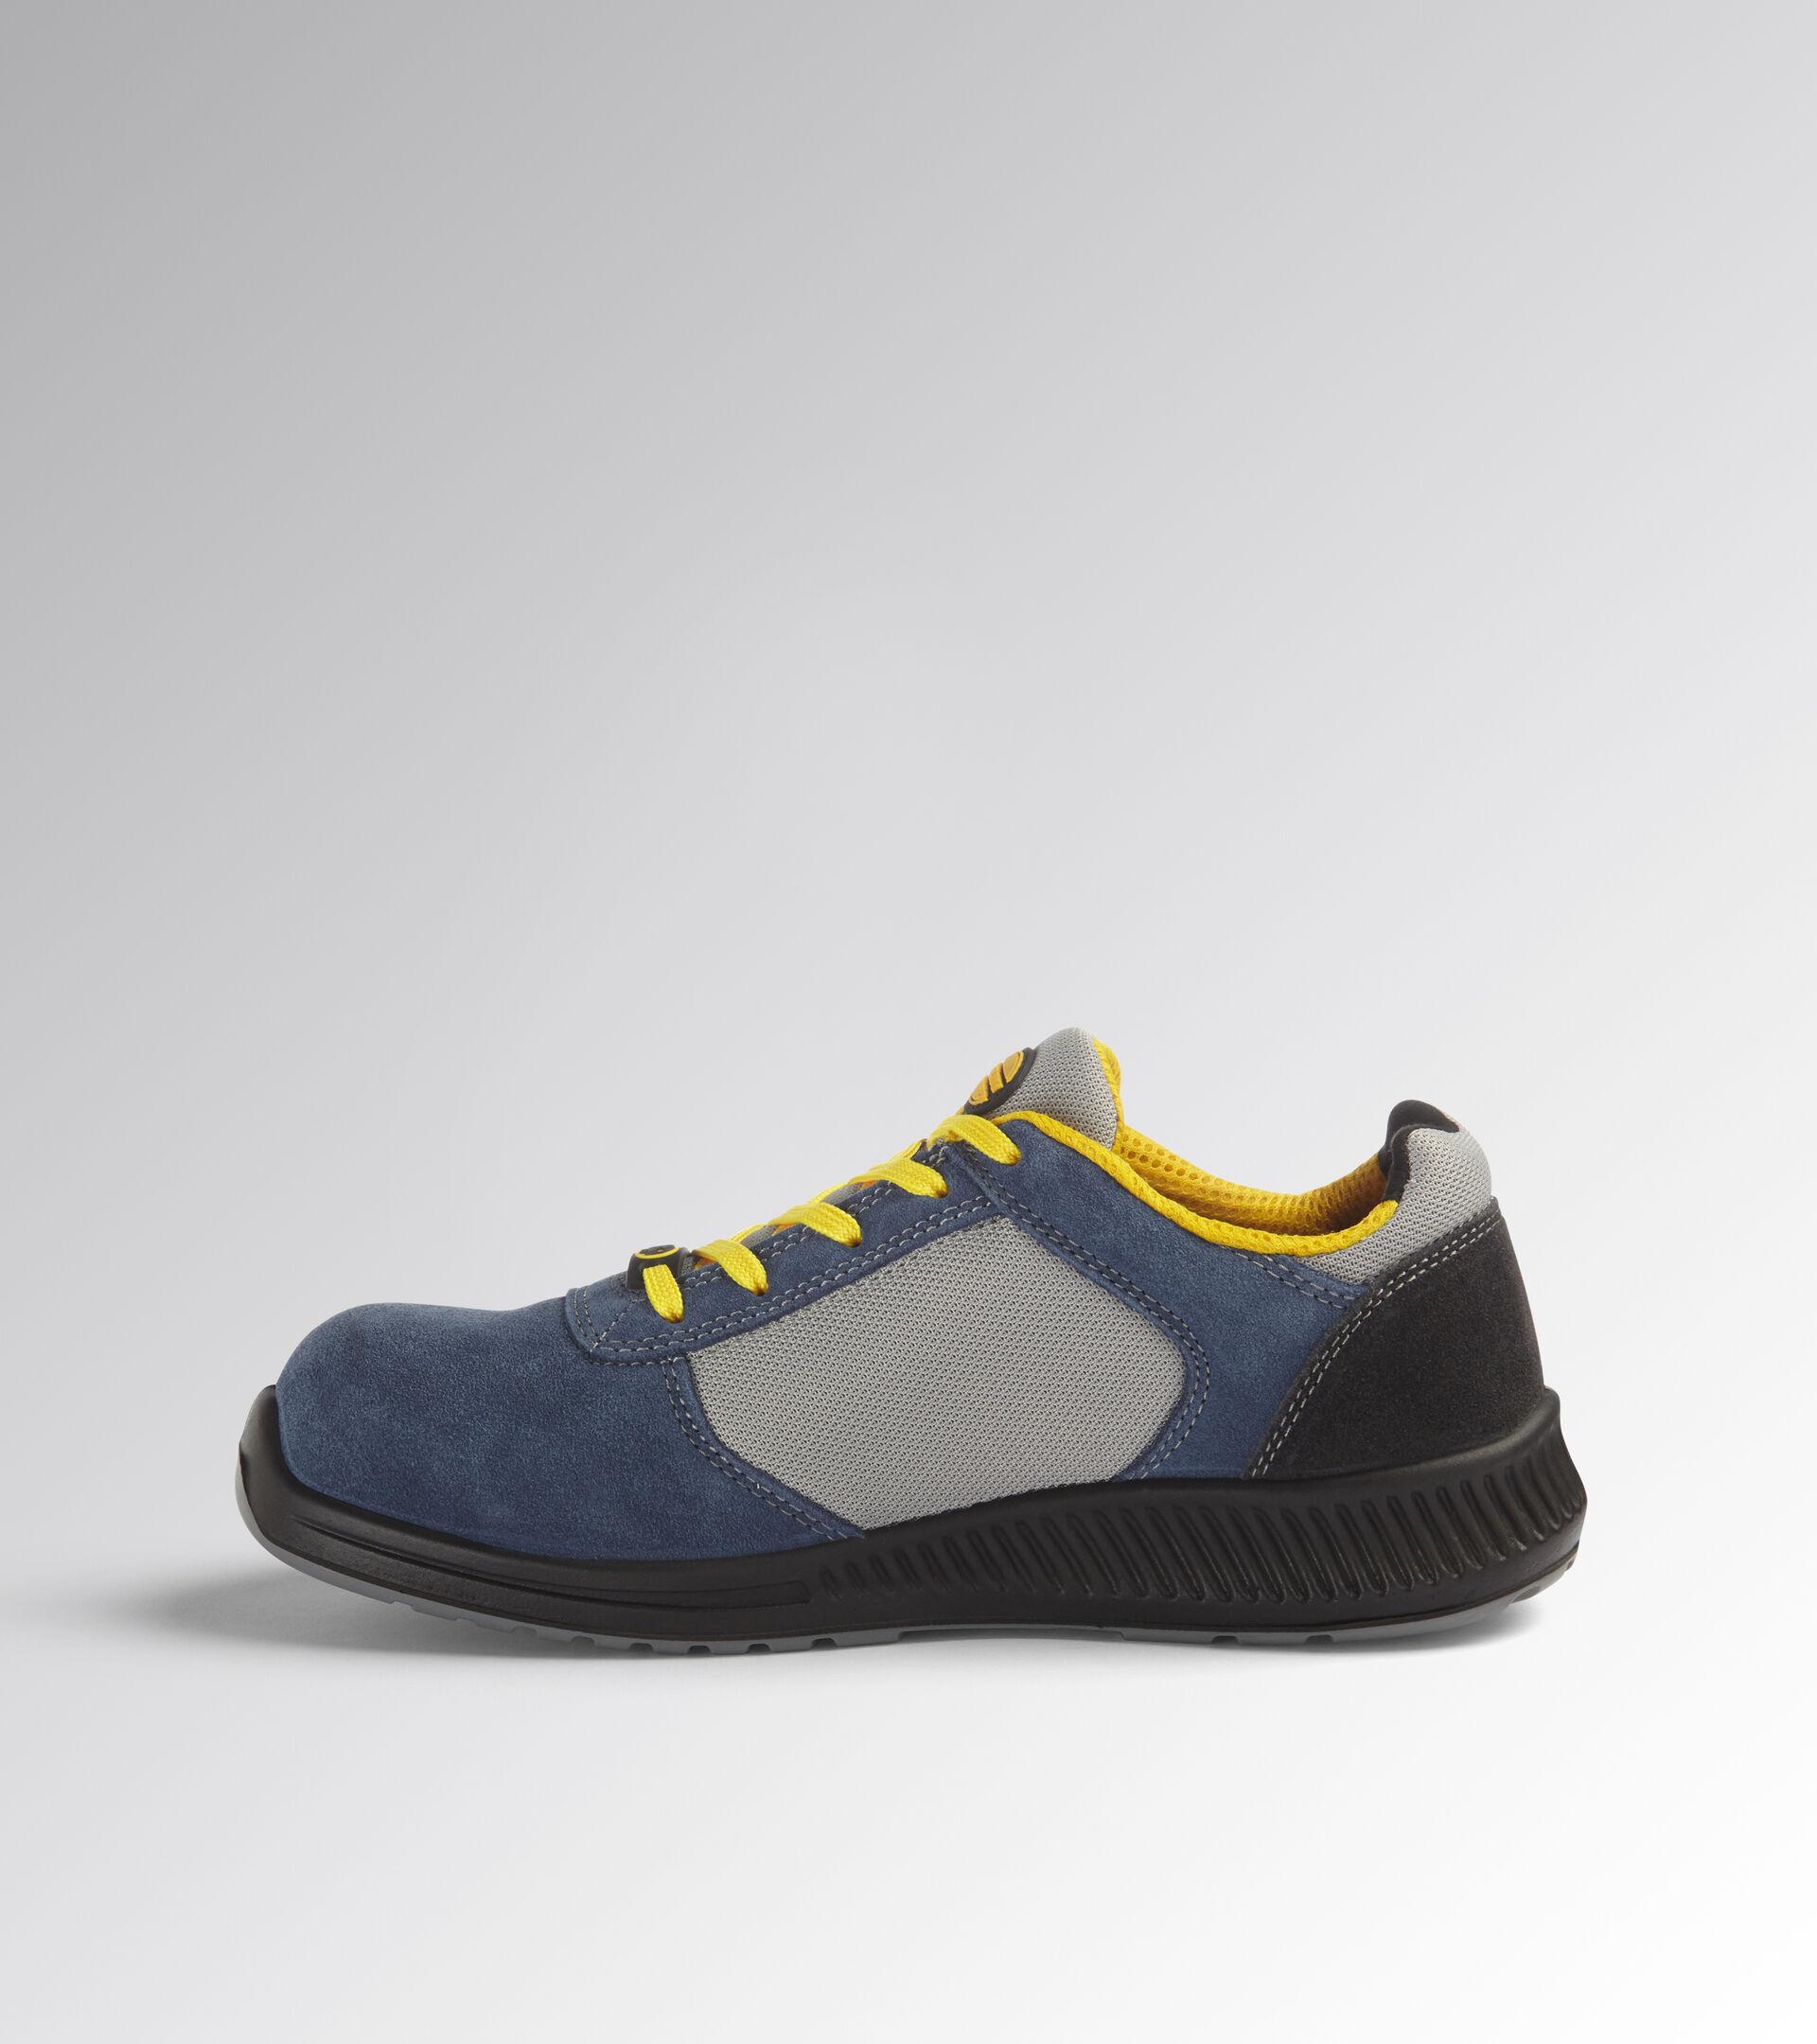 Footwear Utility UNISEX FORMULA LOW S1P SRC ESD BLUE ATLANTIC Utility